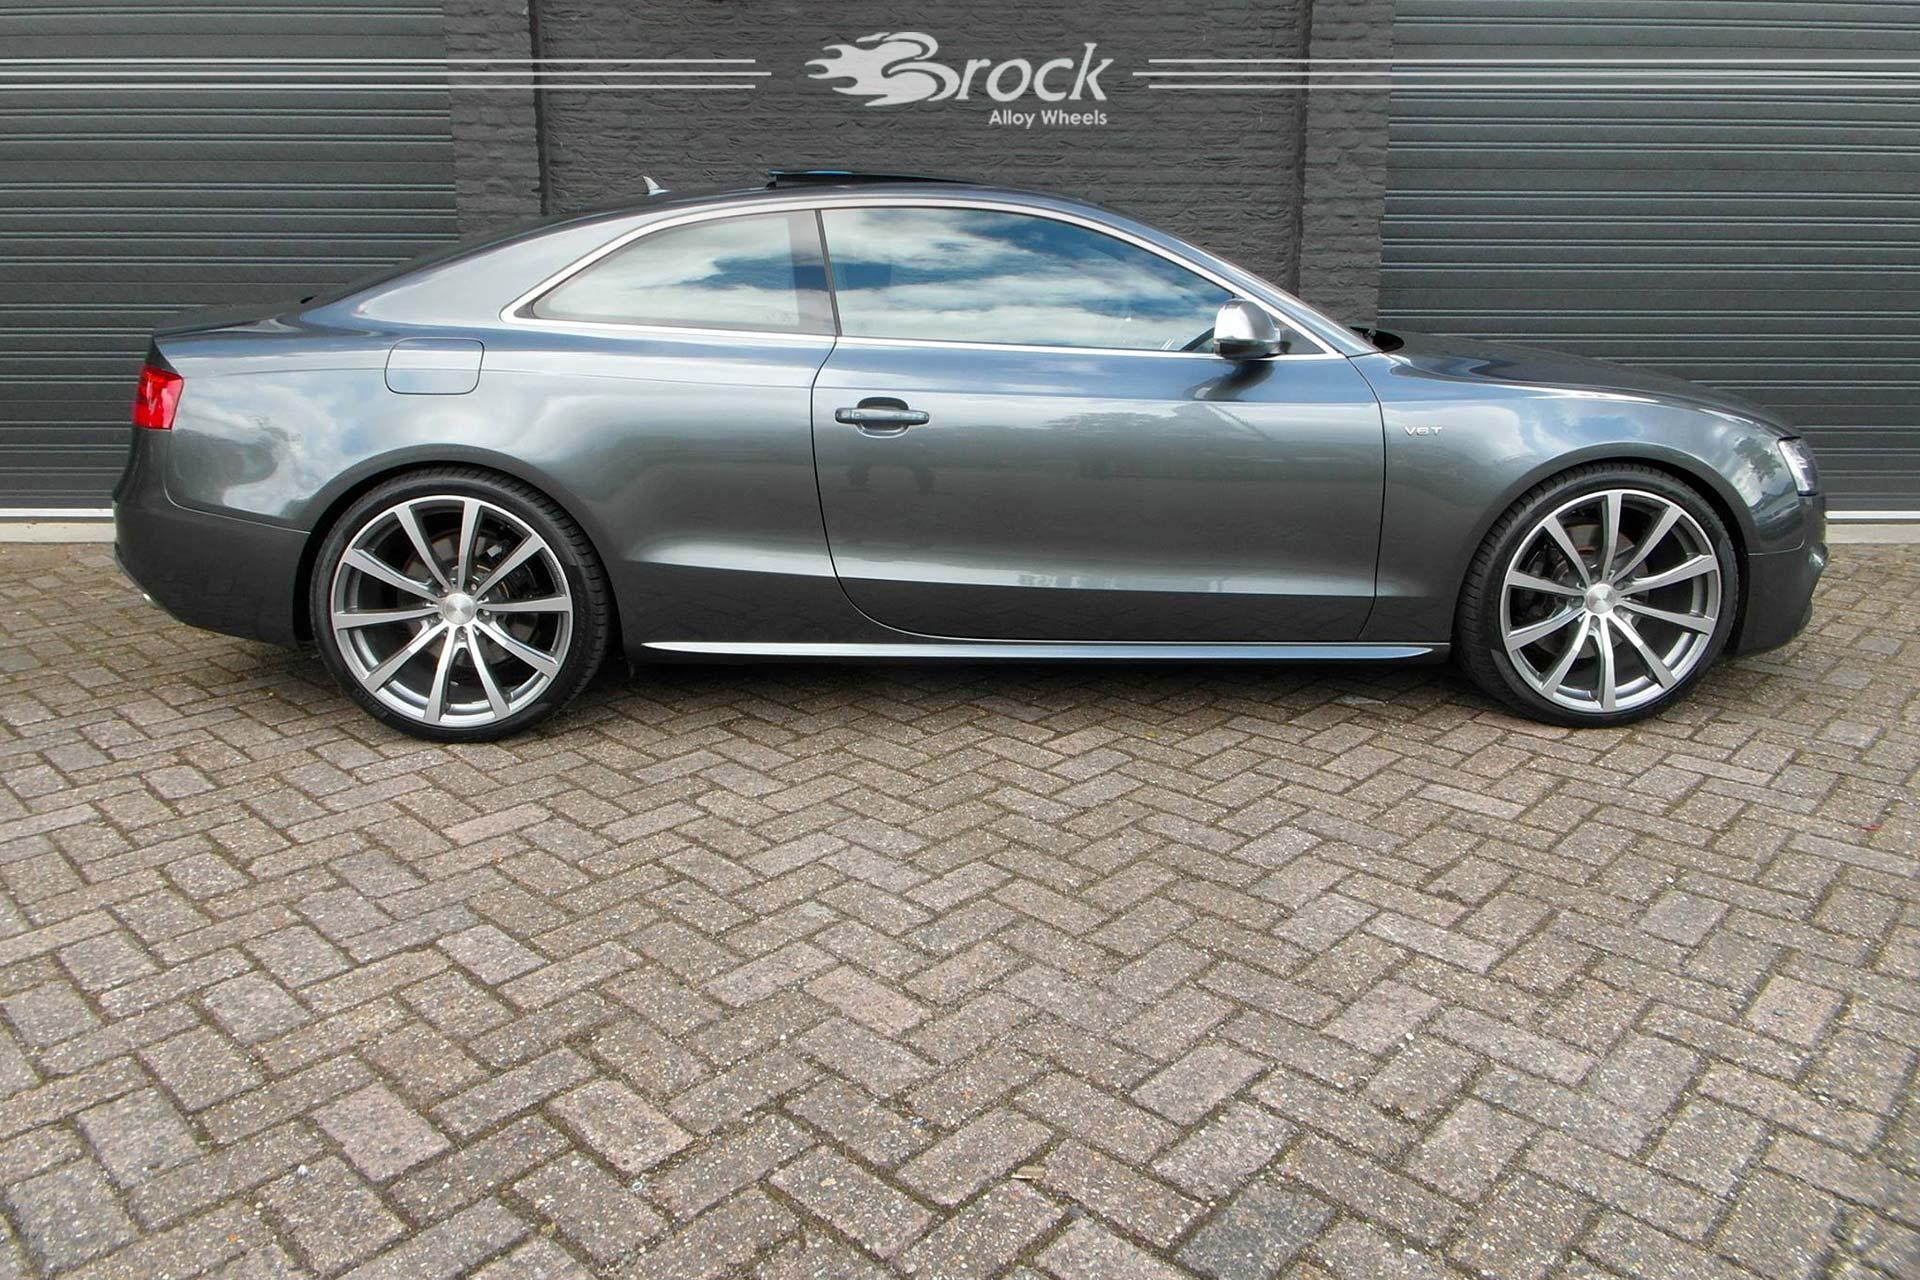 Audi S5 Coupe Brock B32 9520 HGVP